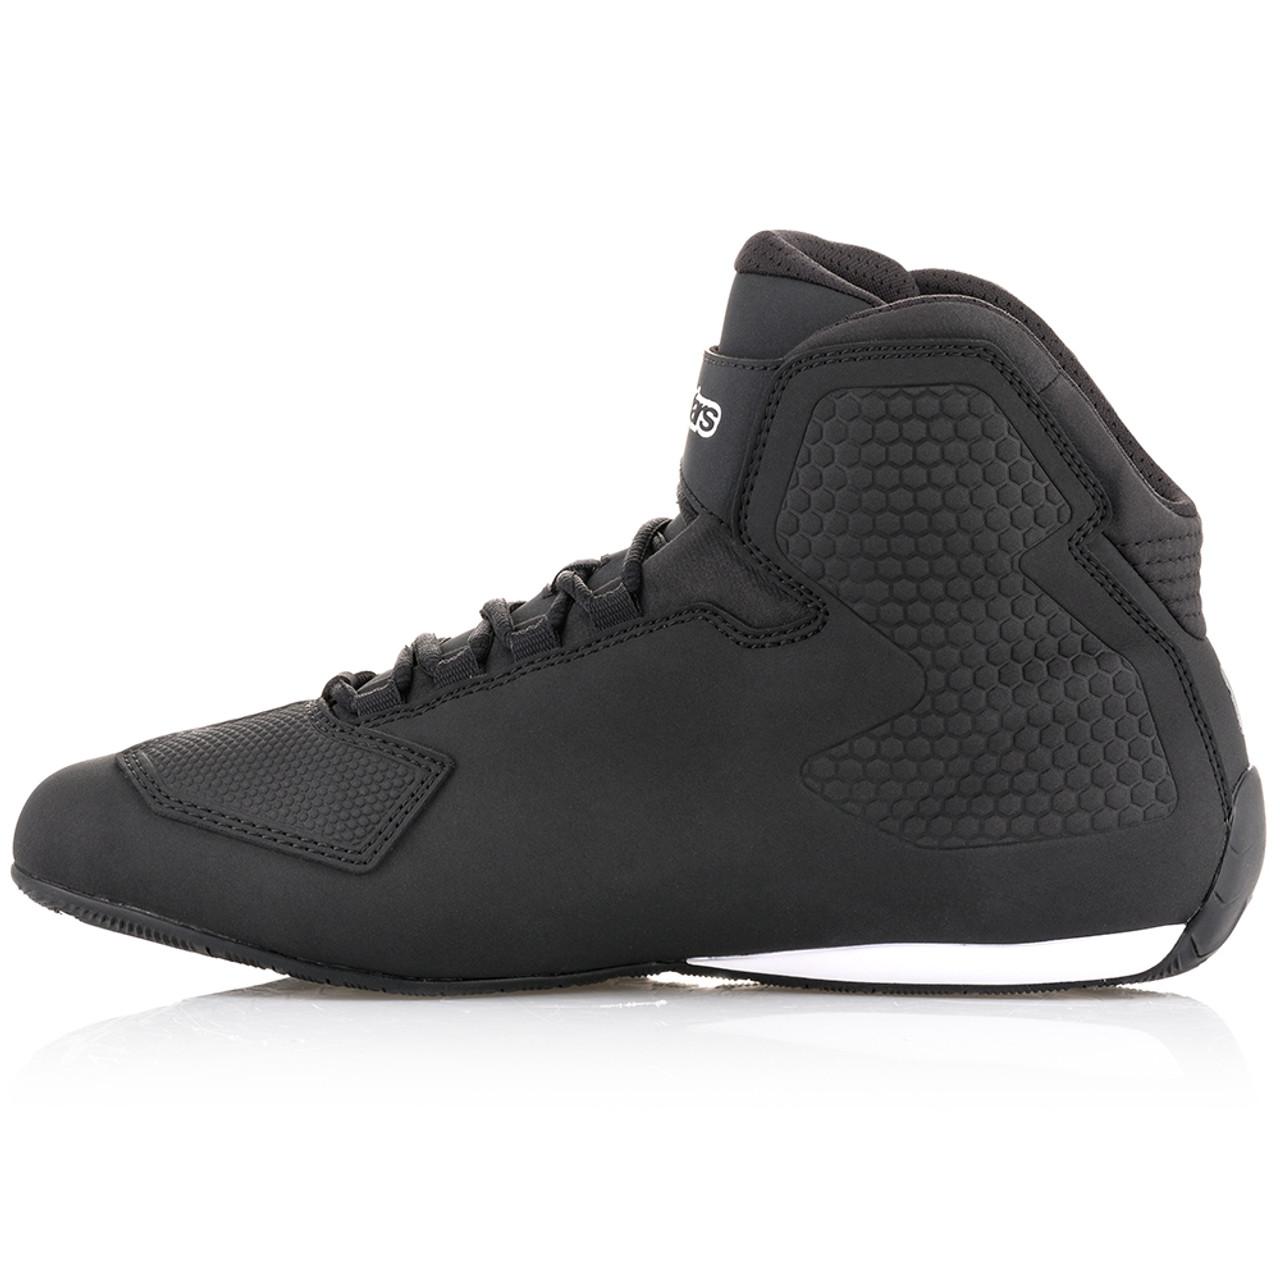 Alpinestars Sektor, chaussures Noir 7 US